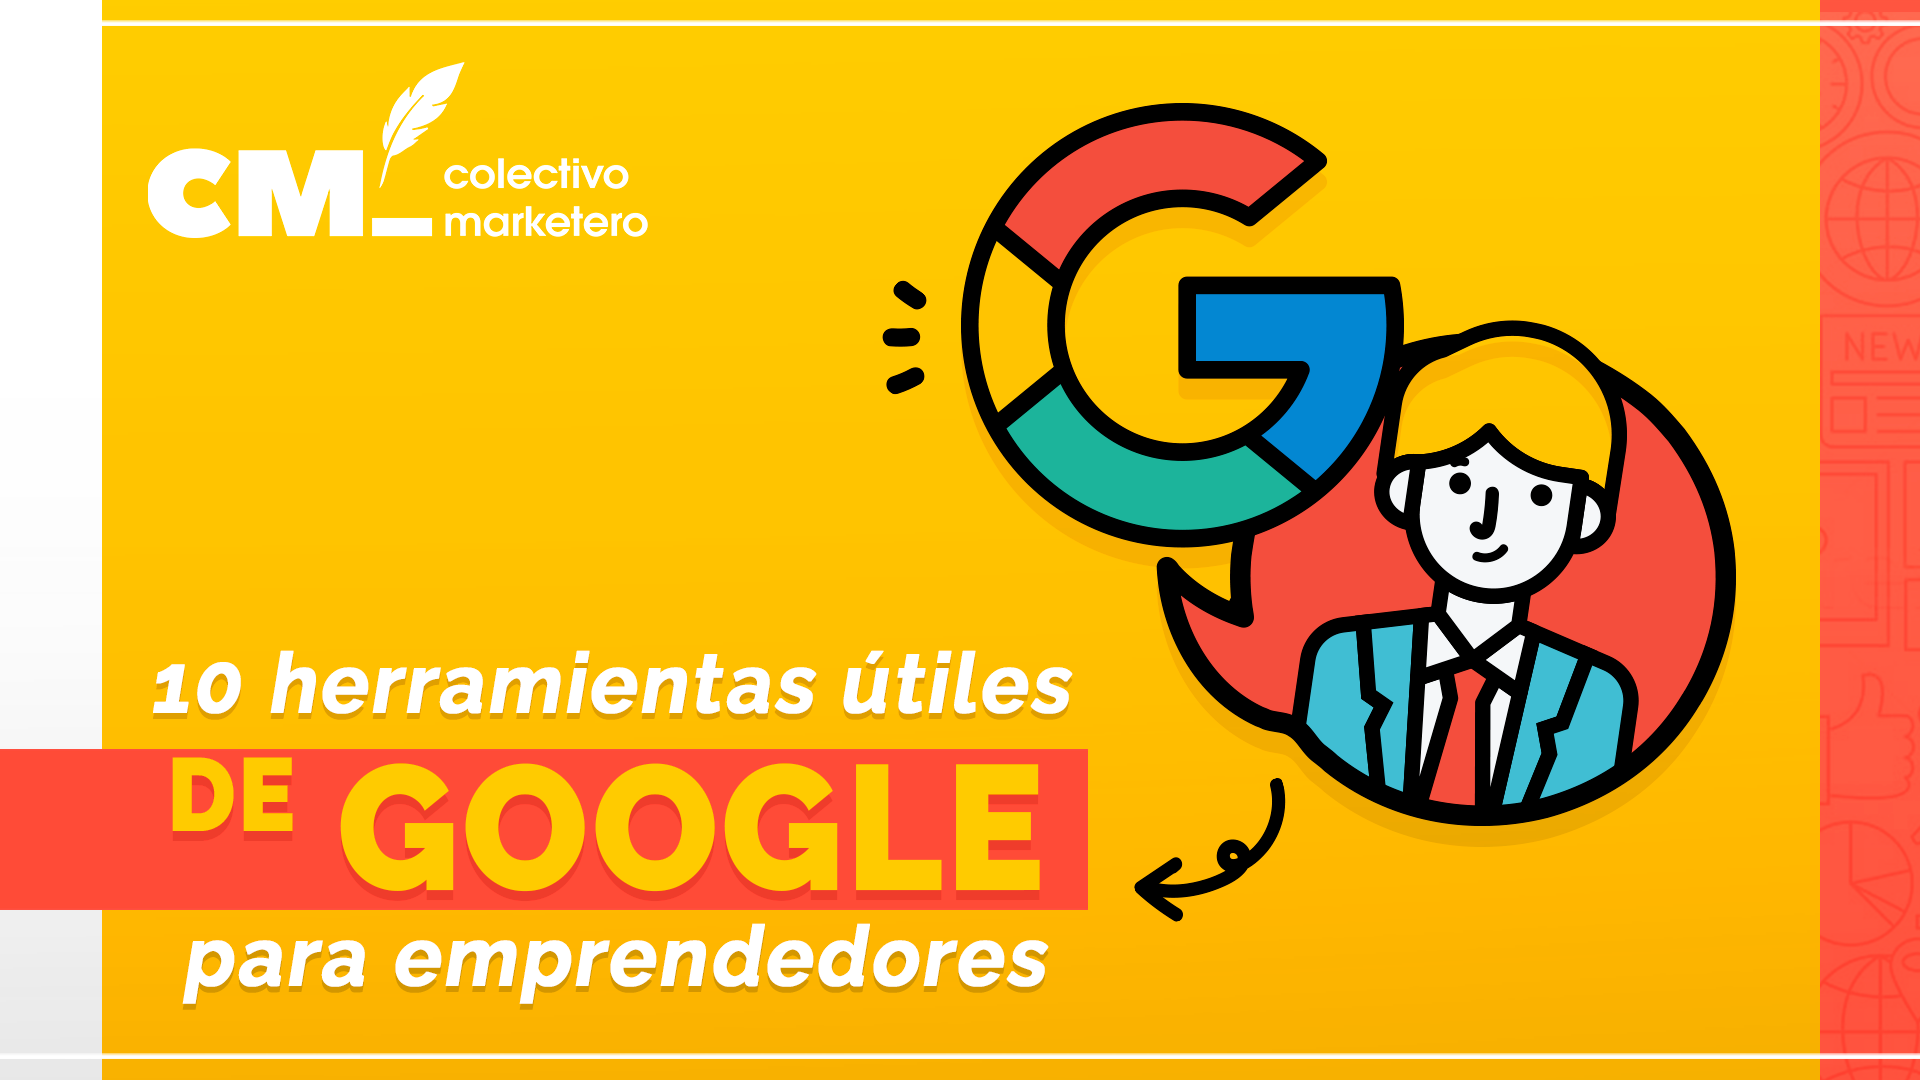 10 herramientas útiles de Google para emprendedores